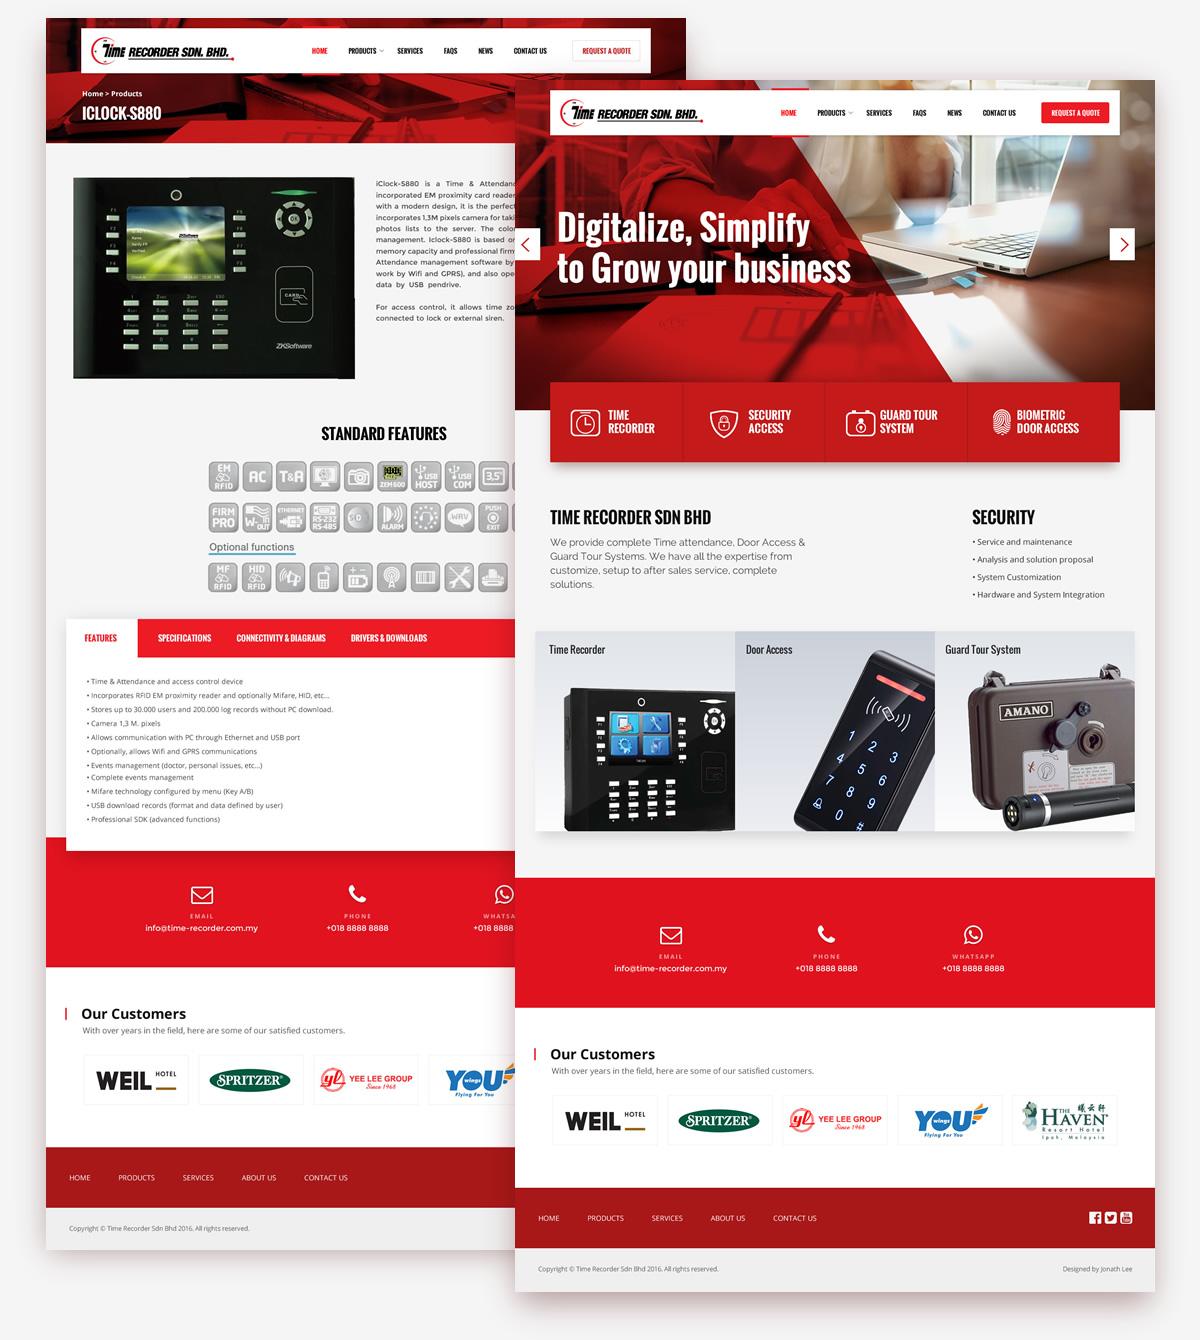 Stunning Red colored website design